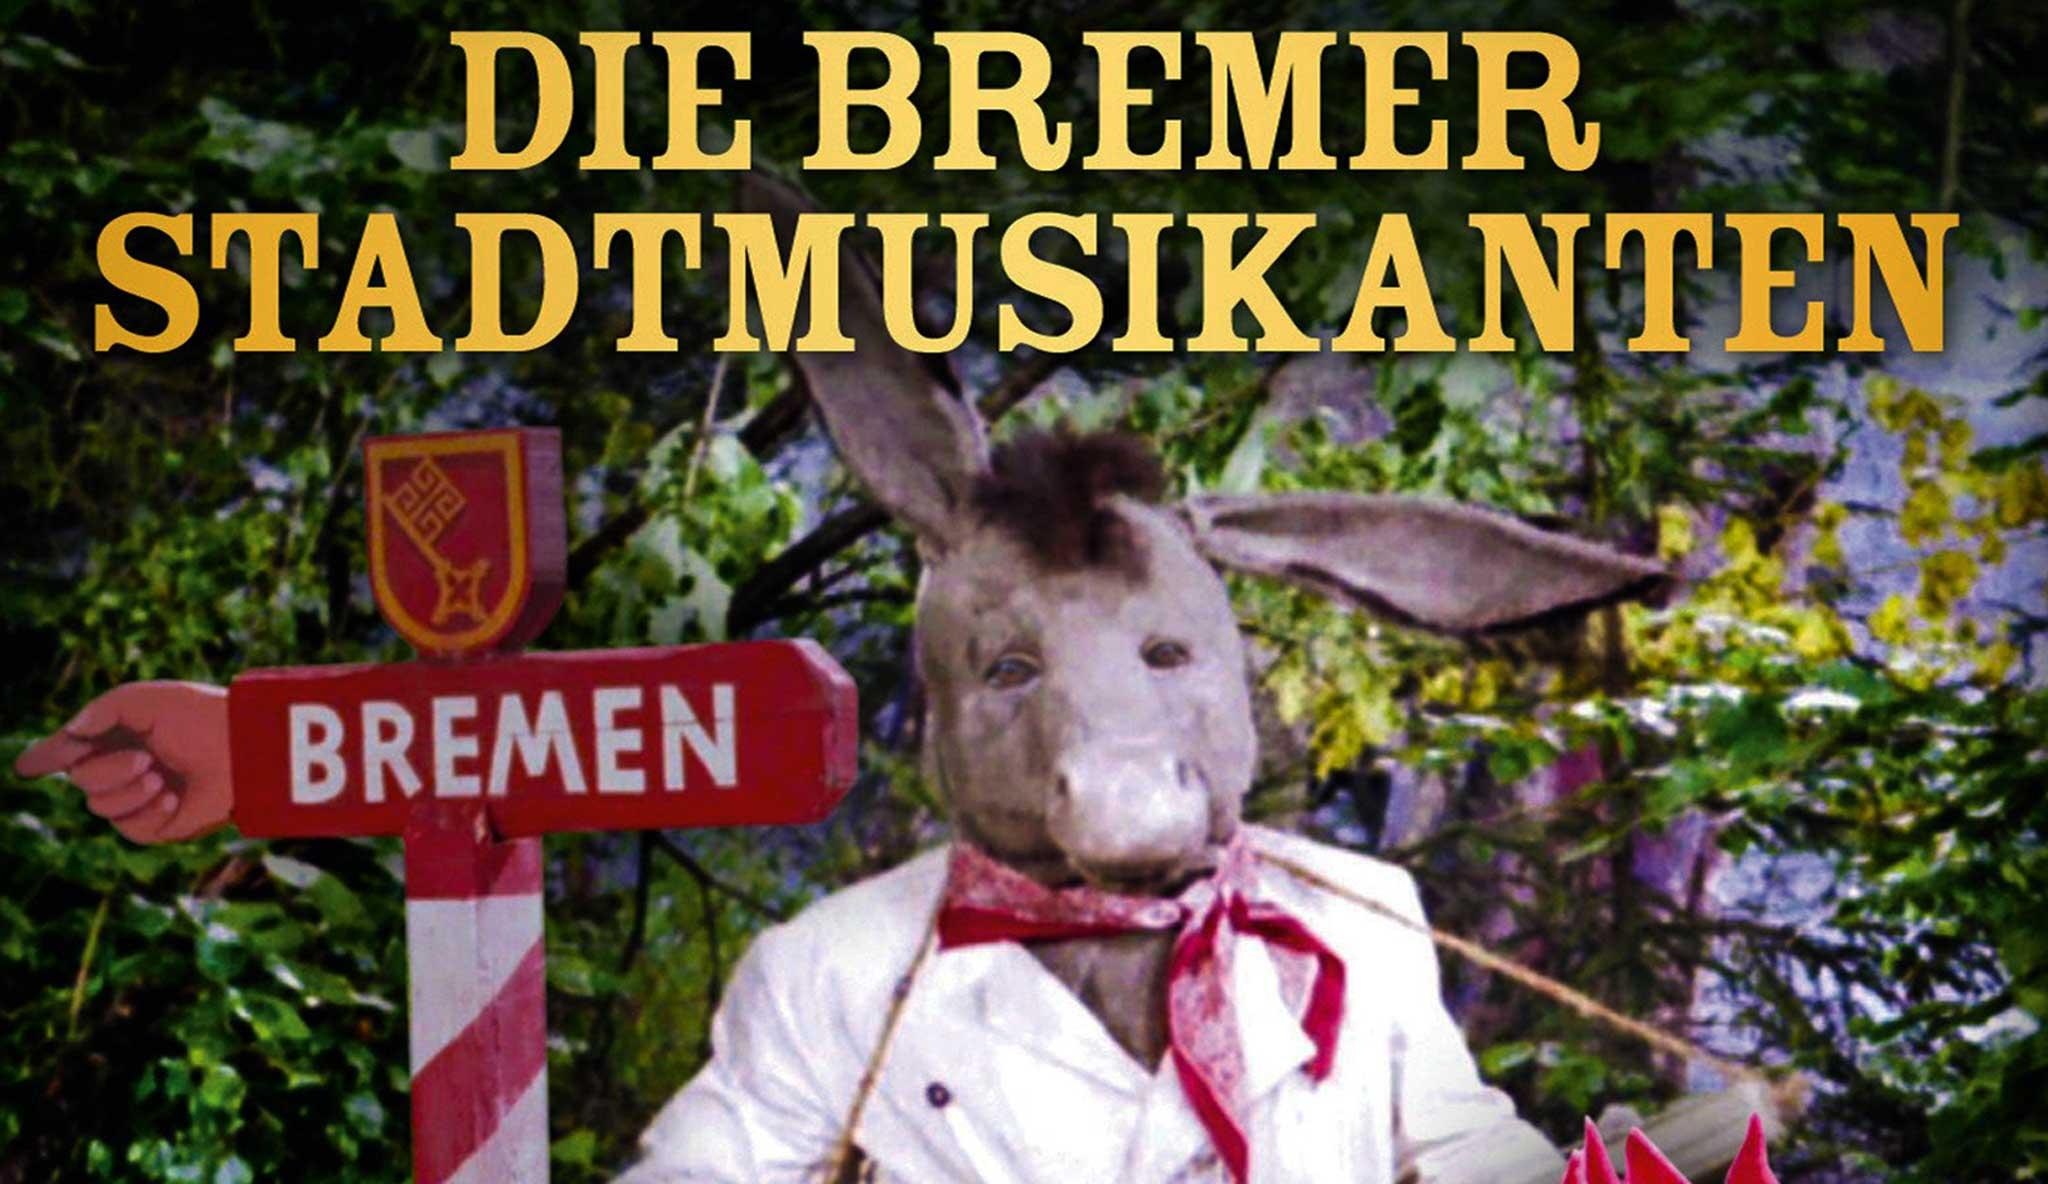 die-bremer-stadtmusikanten\header.jpg